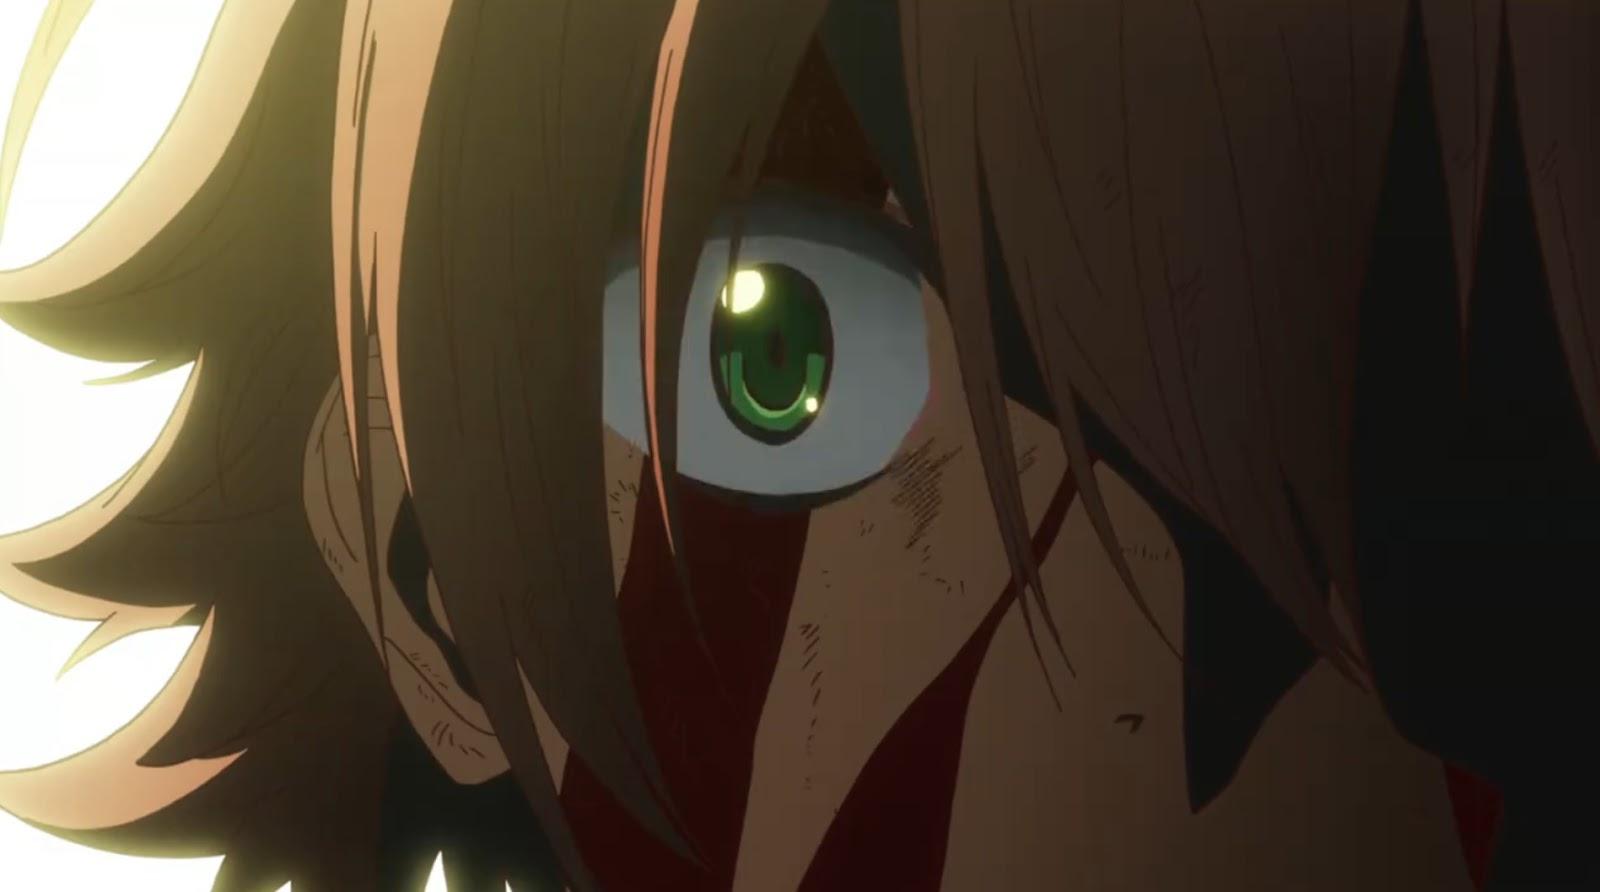 Assistir Akame ga Kill Episódio 23 HD, Akame ga Kill Episódio 23, Akame ga Kill! Episódio 23, Legendado Online, Akame ga Kill Episódio 23 Todos os Episódios